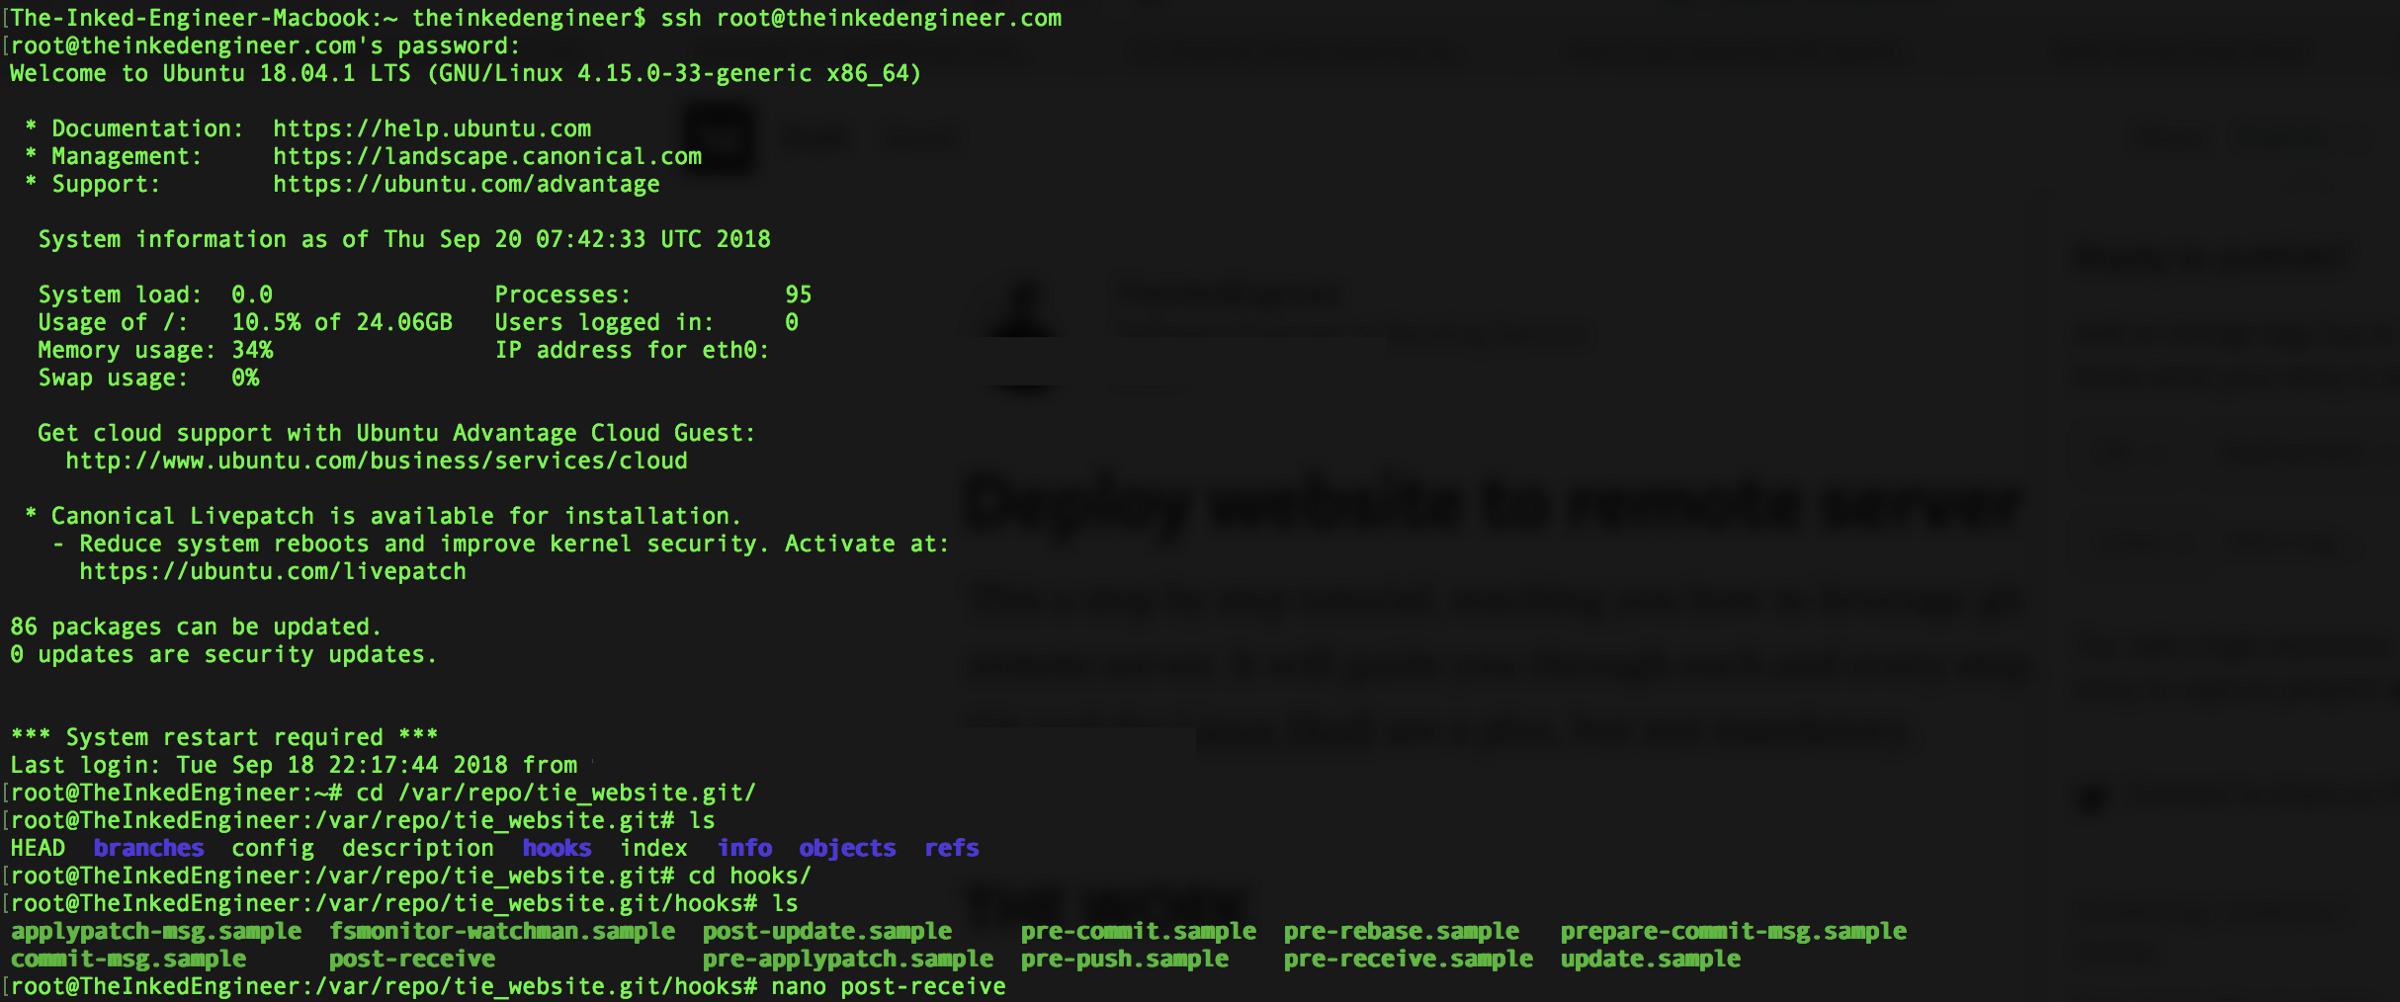 /deploy-website-to-remote-server-using-git-da6048805637 feature image